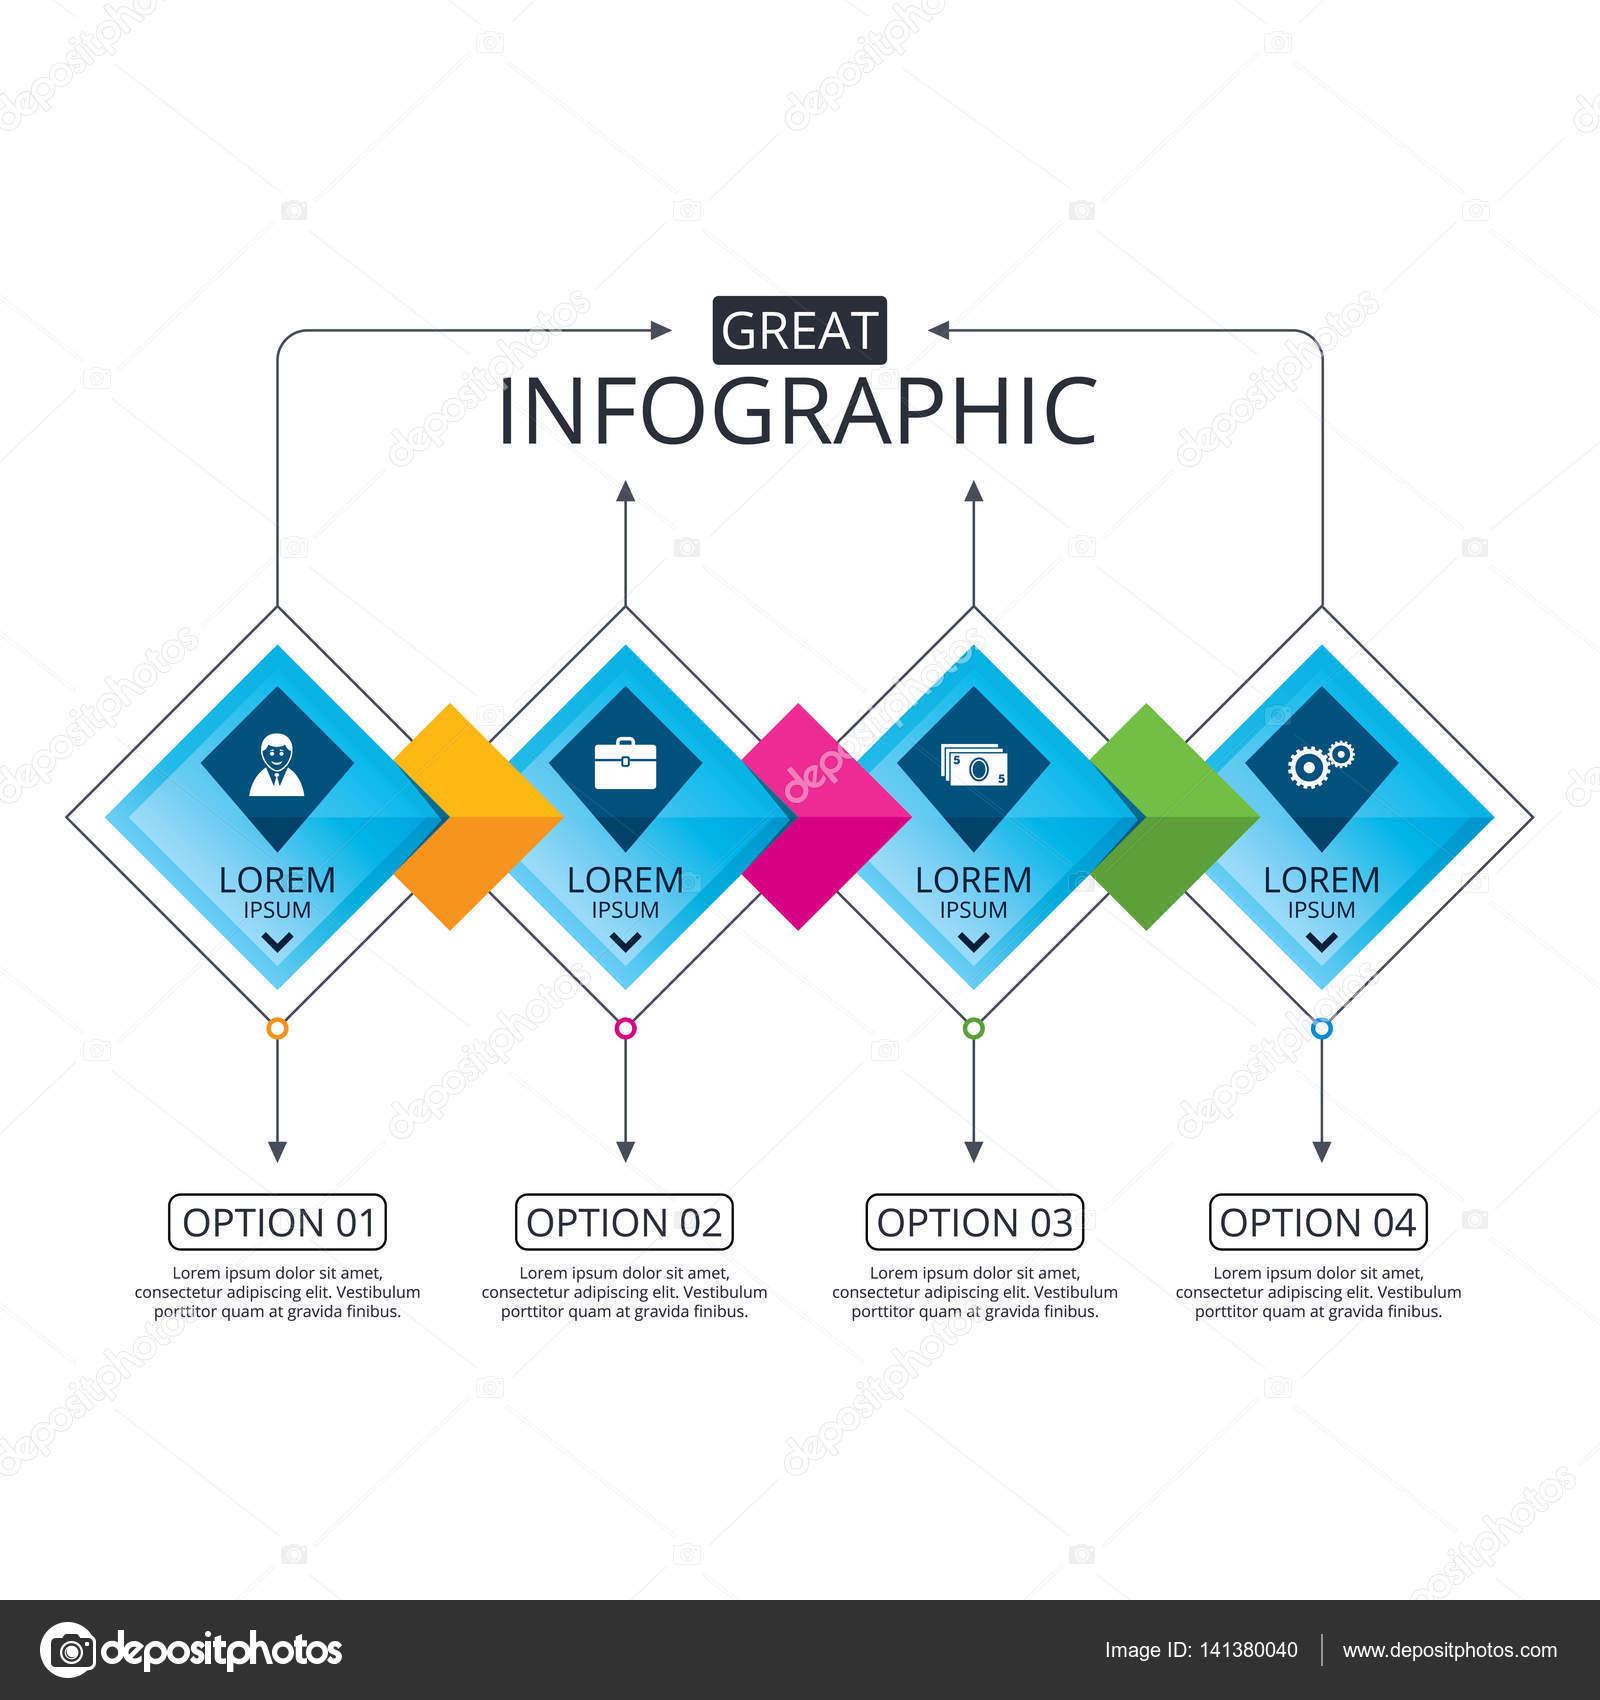 Infografik Flussdiagramm Vorlage — Stockvektor © Blankstock #141380040